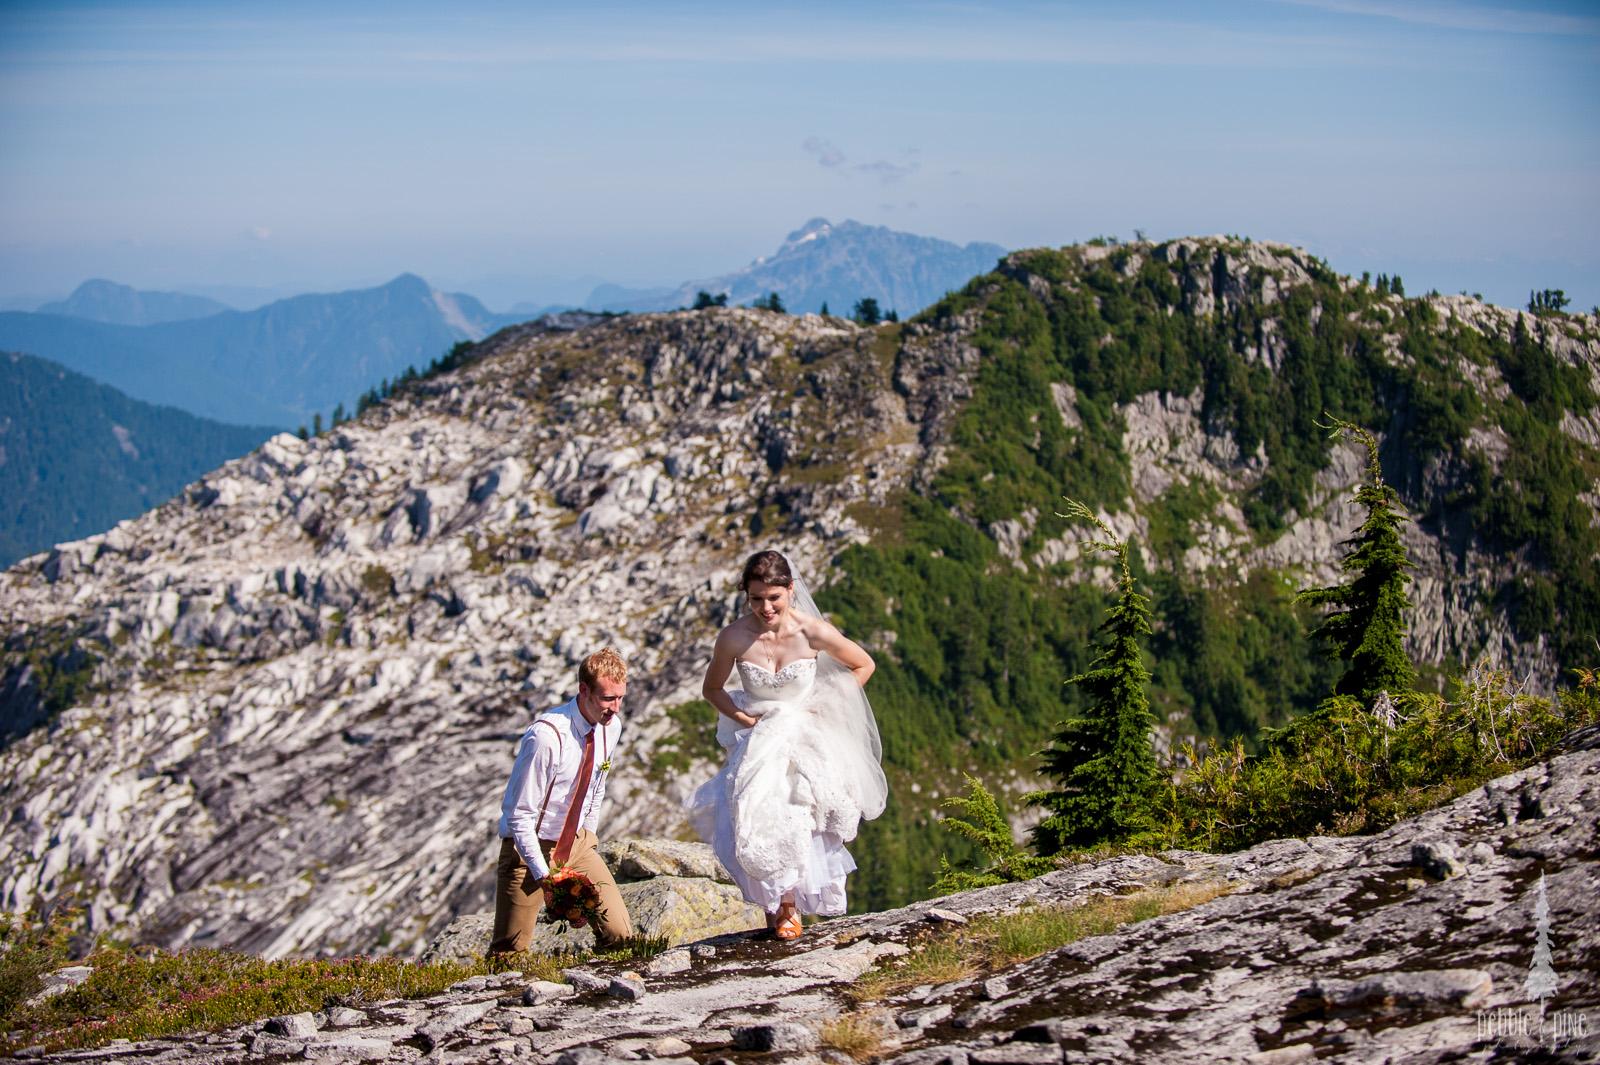 vancouver-island-wedding-photographers-golden-eagle-golf-course-wedding-mountaintop-wedding-44.jpg